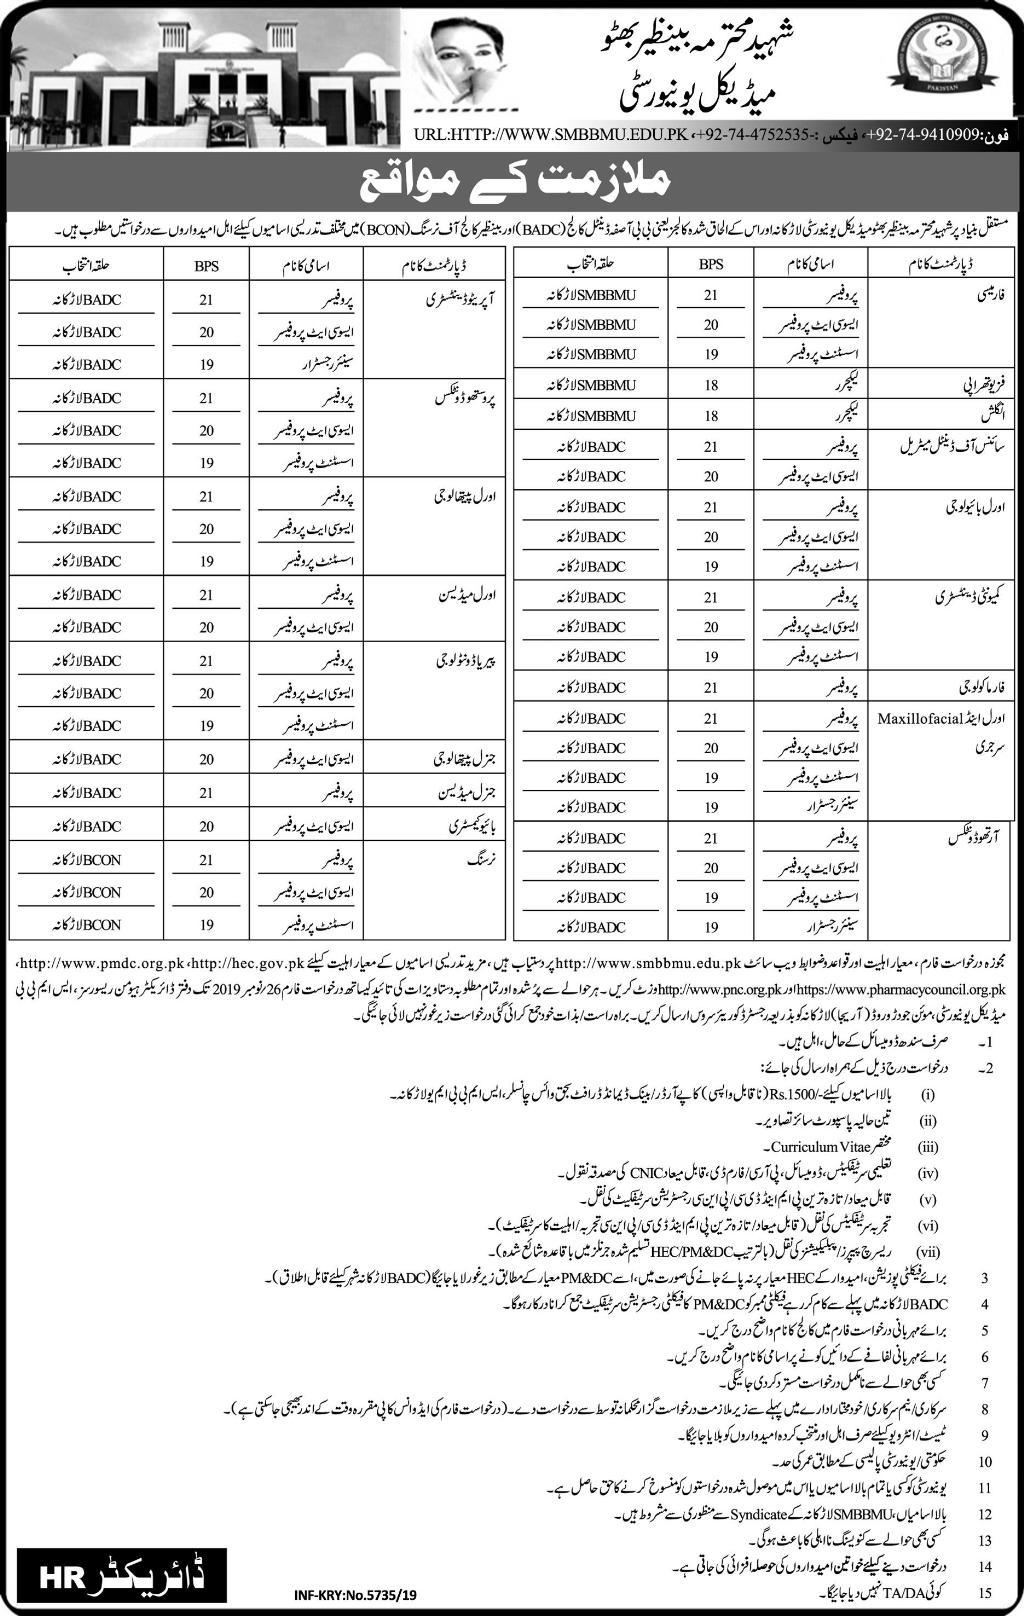 Shaheed Mohtarma Benazir Bhutto Medical University Jobs 6th November 2019